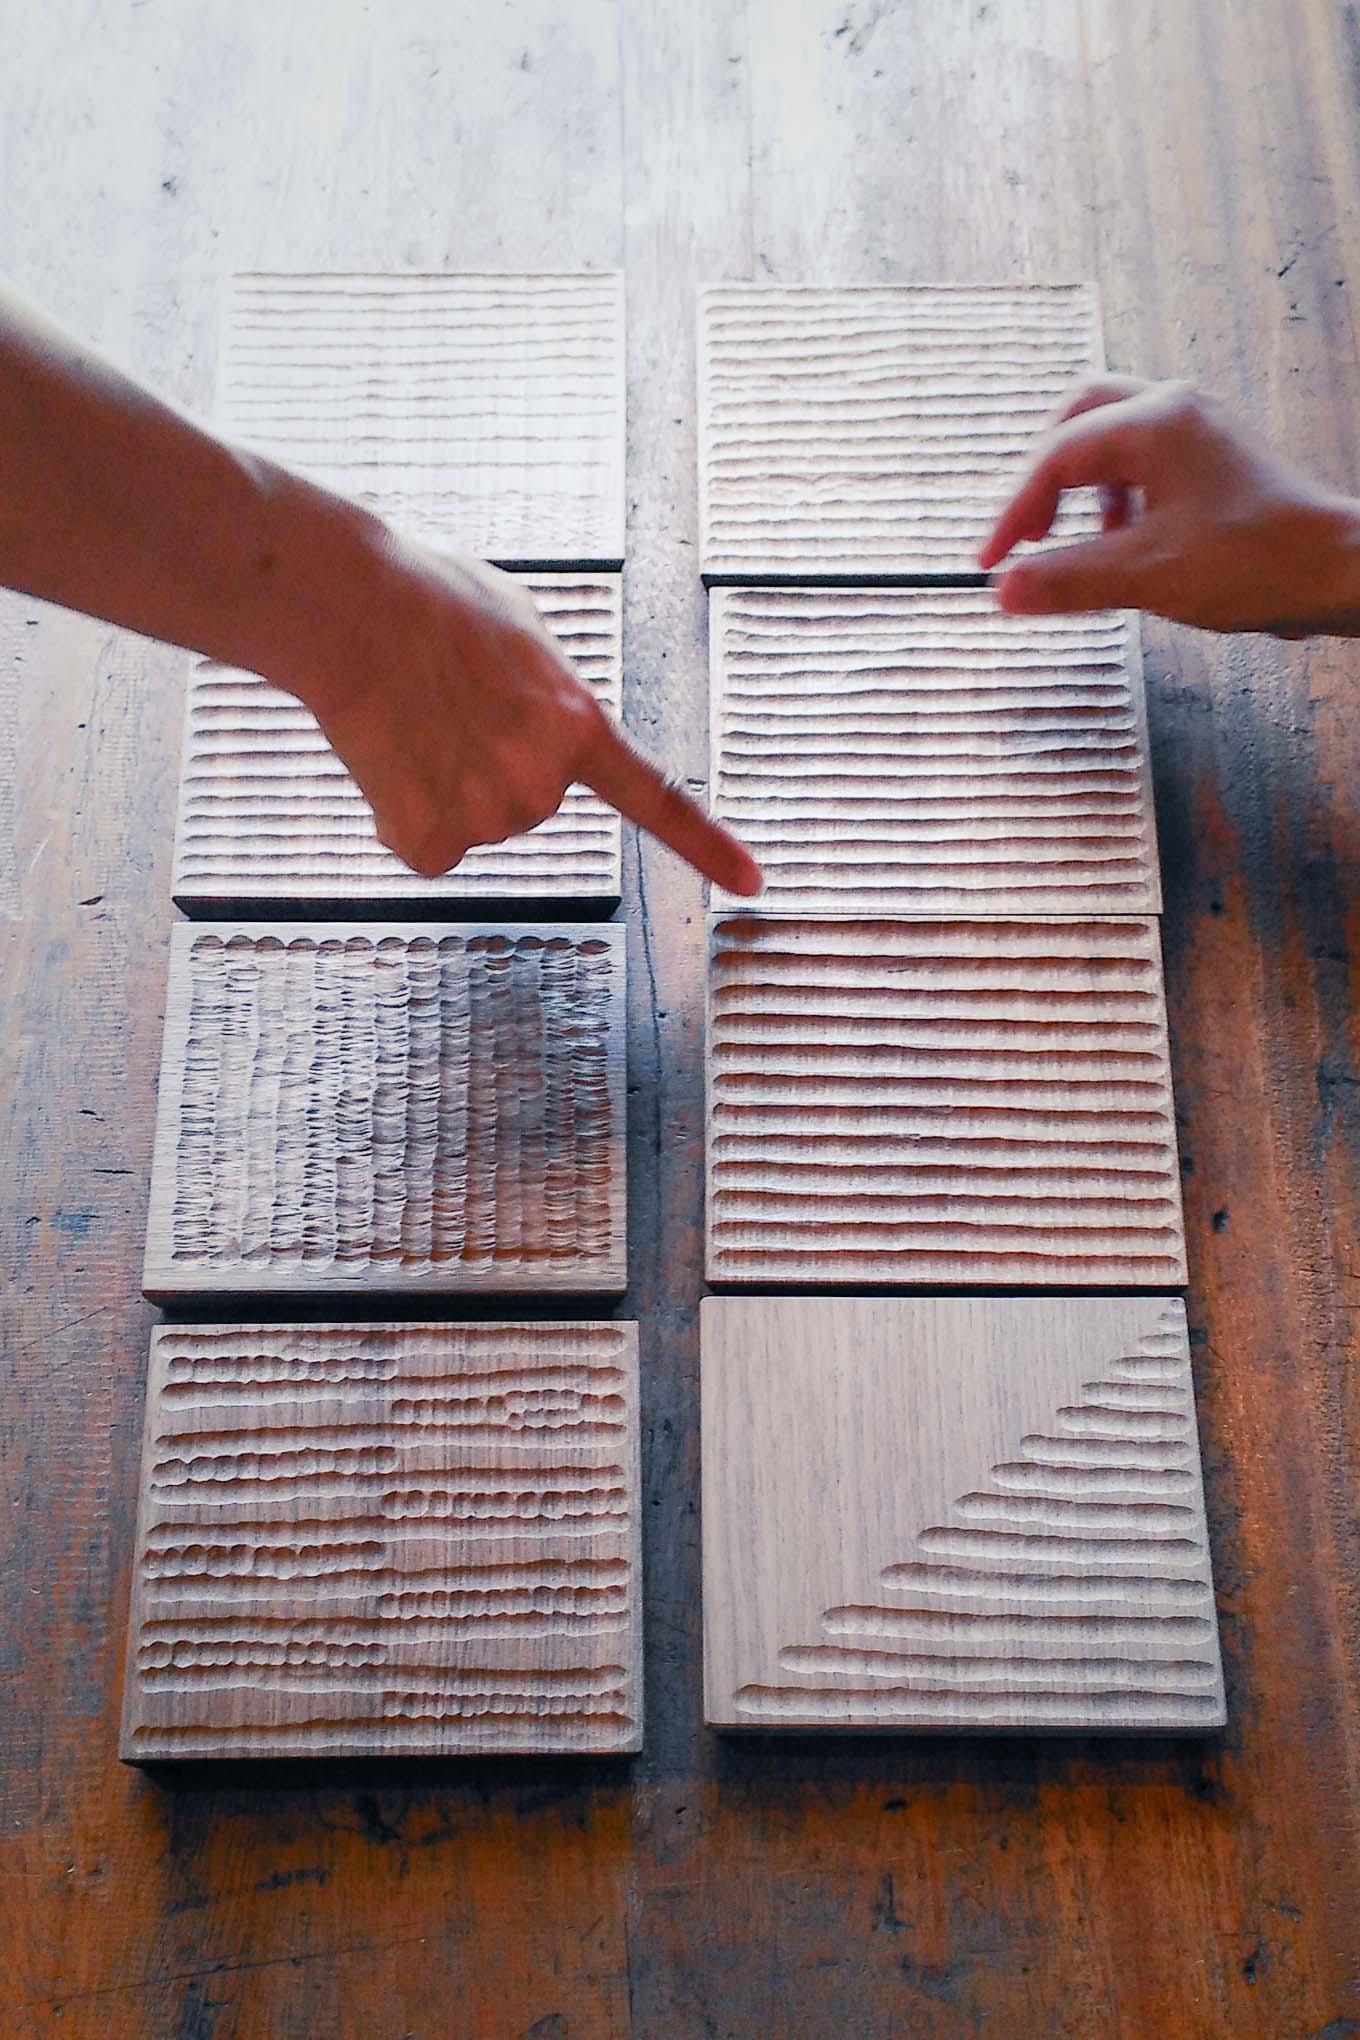 kaga-masayuki-wood-plate-11